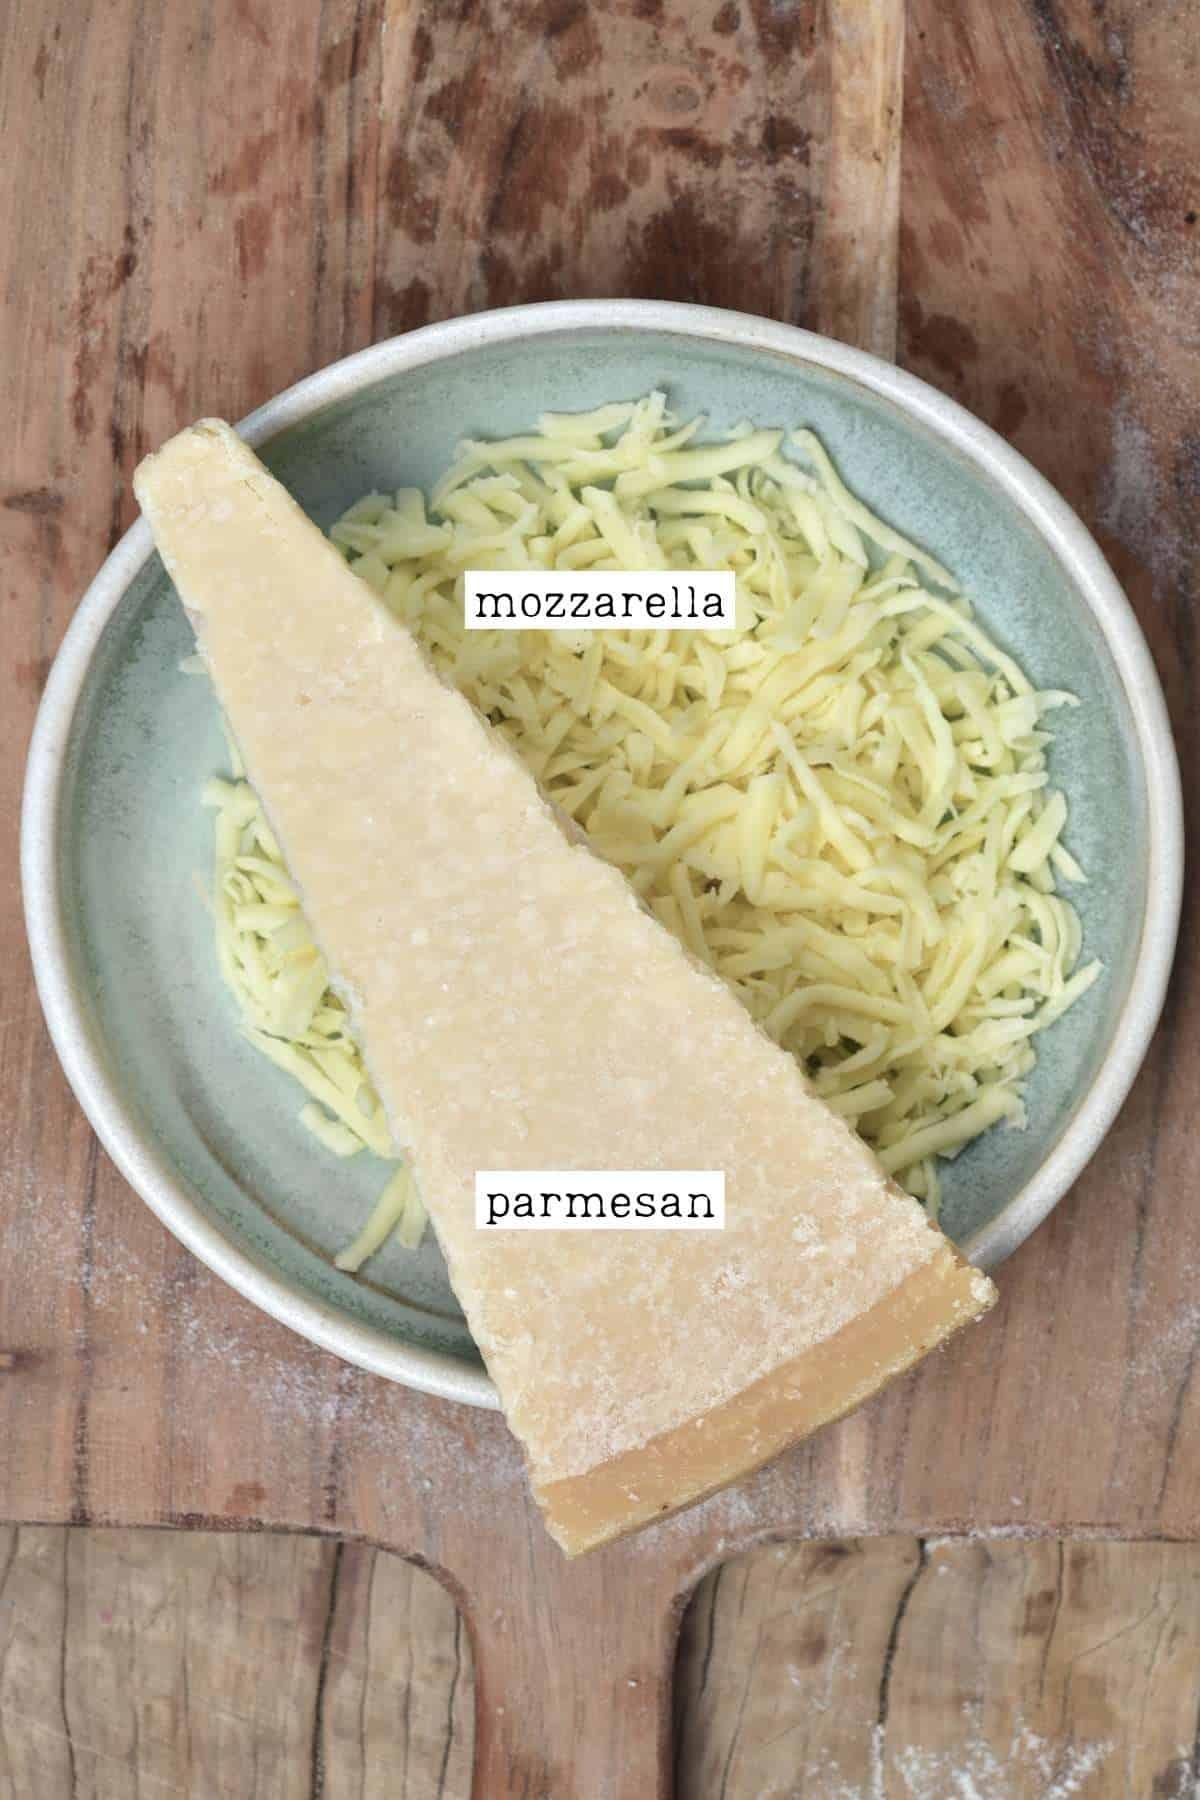 Parmesan and mozzarella